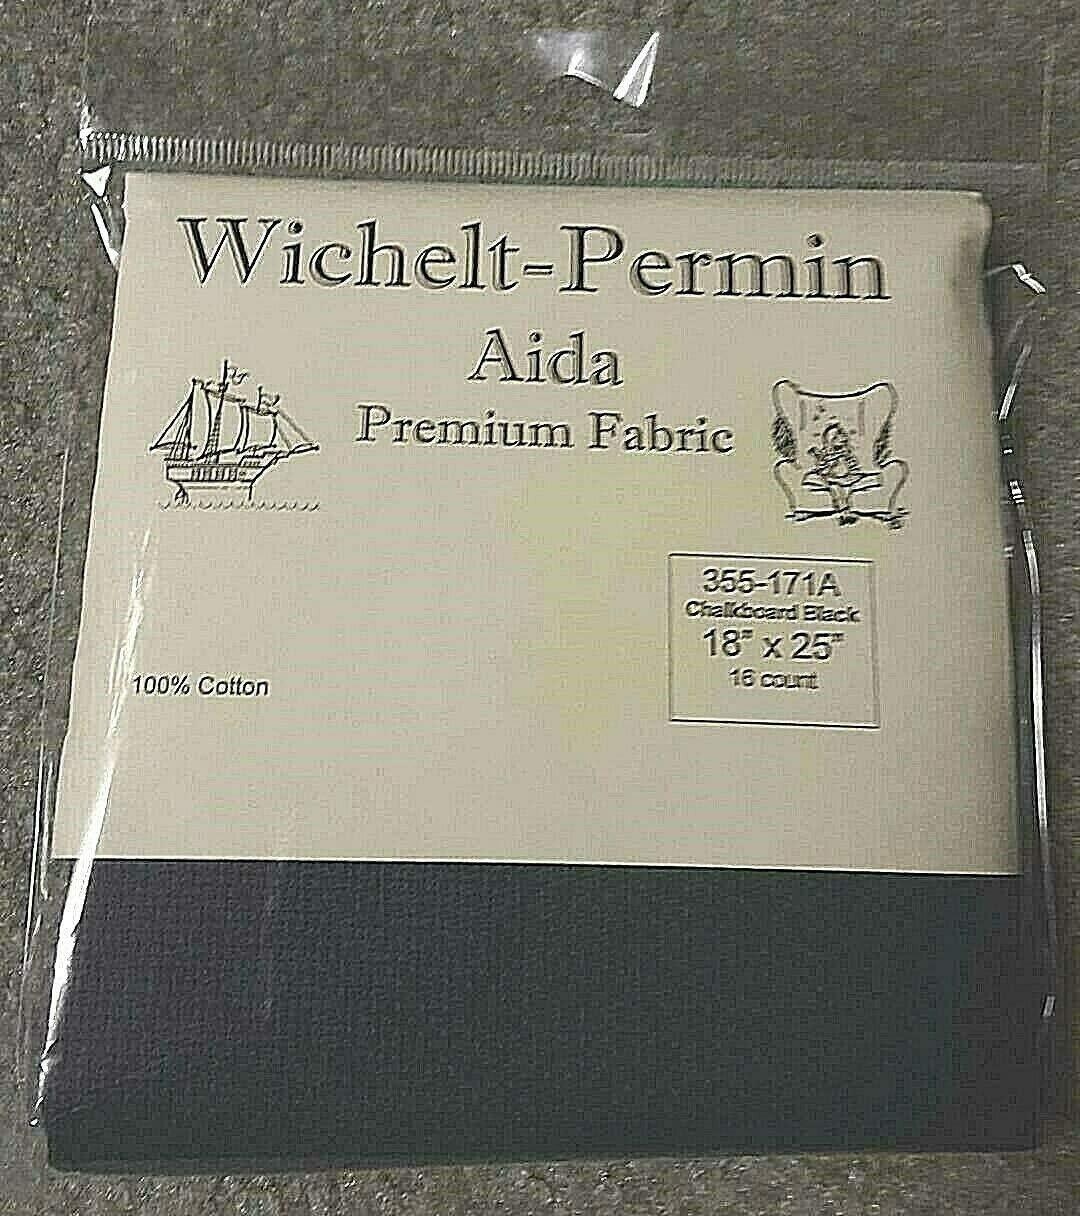 Wichelt Permin Premium High material AIDA Cross Chalkbo 16 Super sale period limited Fabric Count Stitch